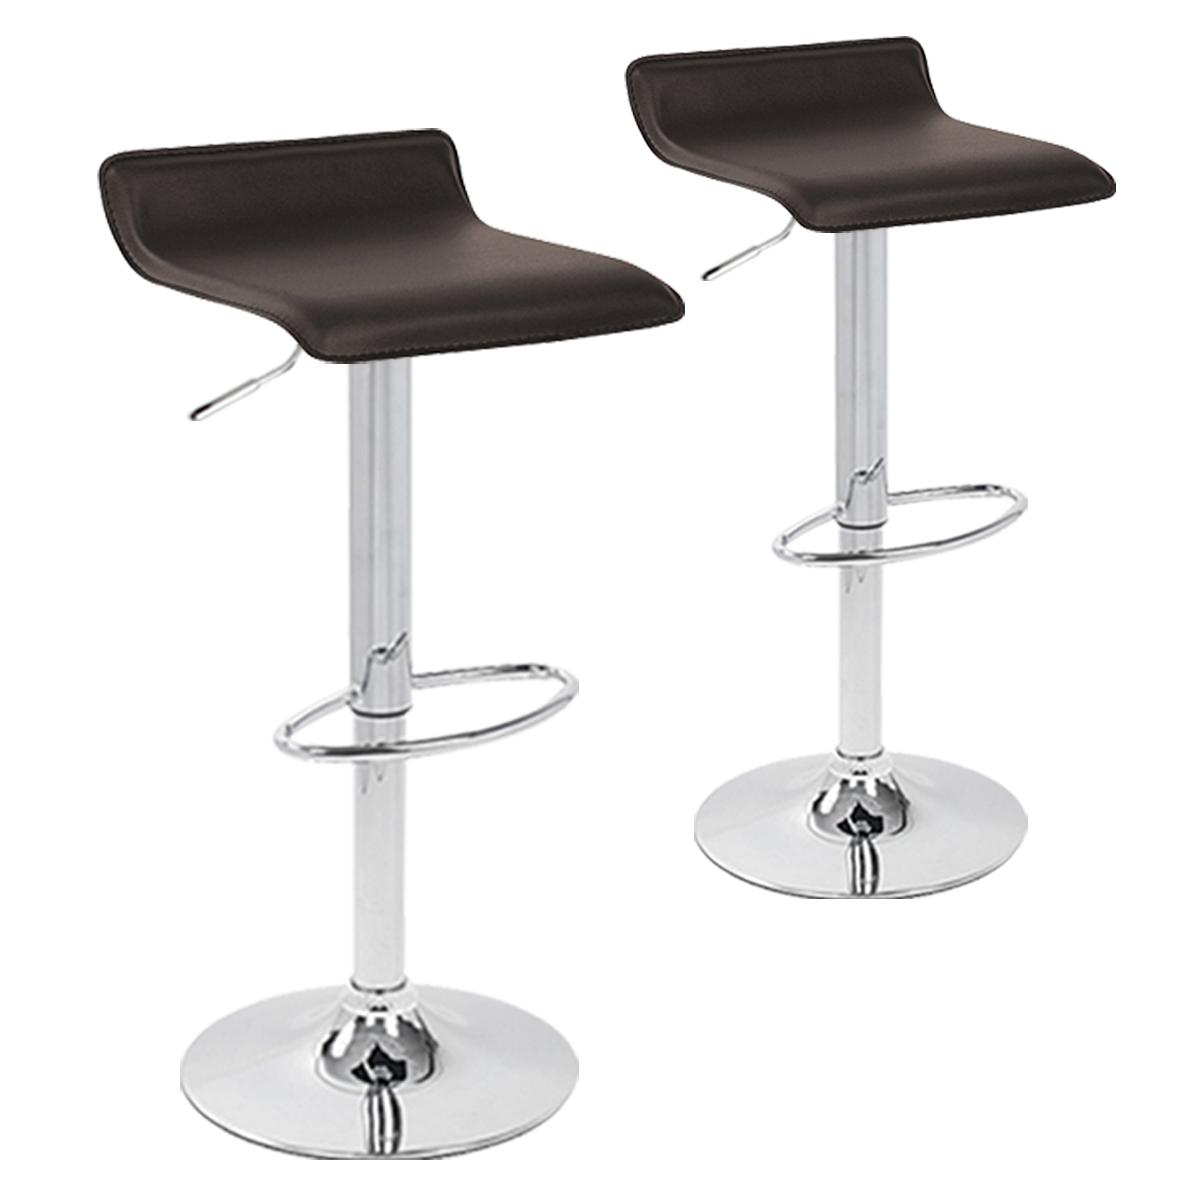 New Kitchen Chair Bar Stool Airlift Swivel Barstools